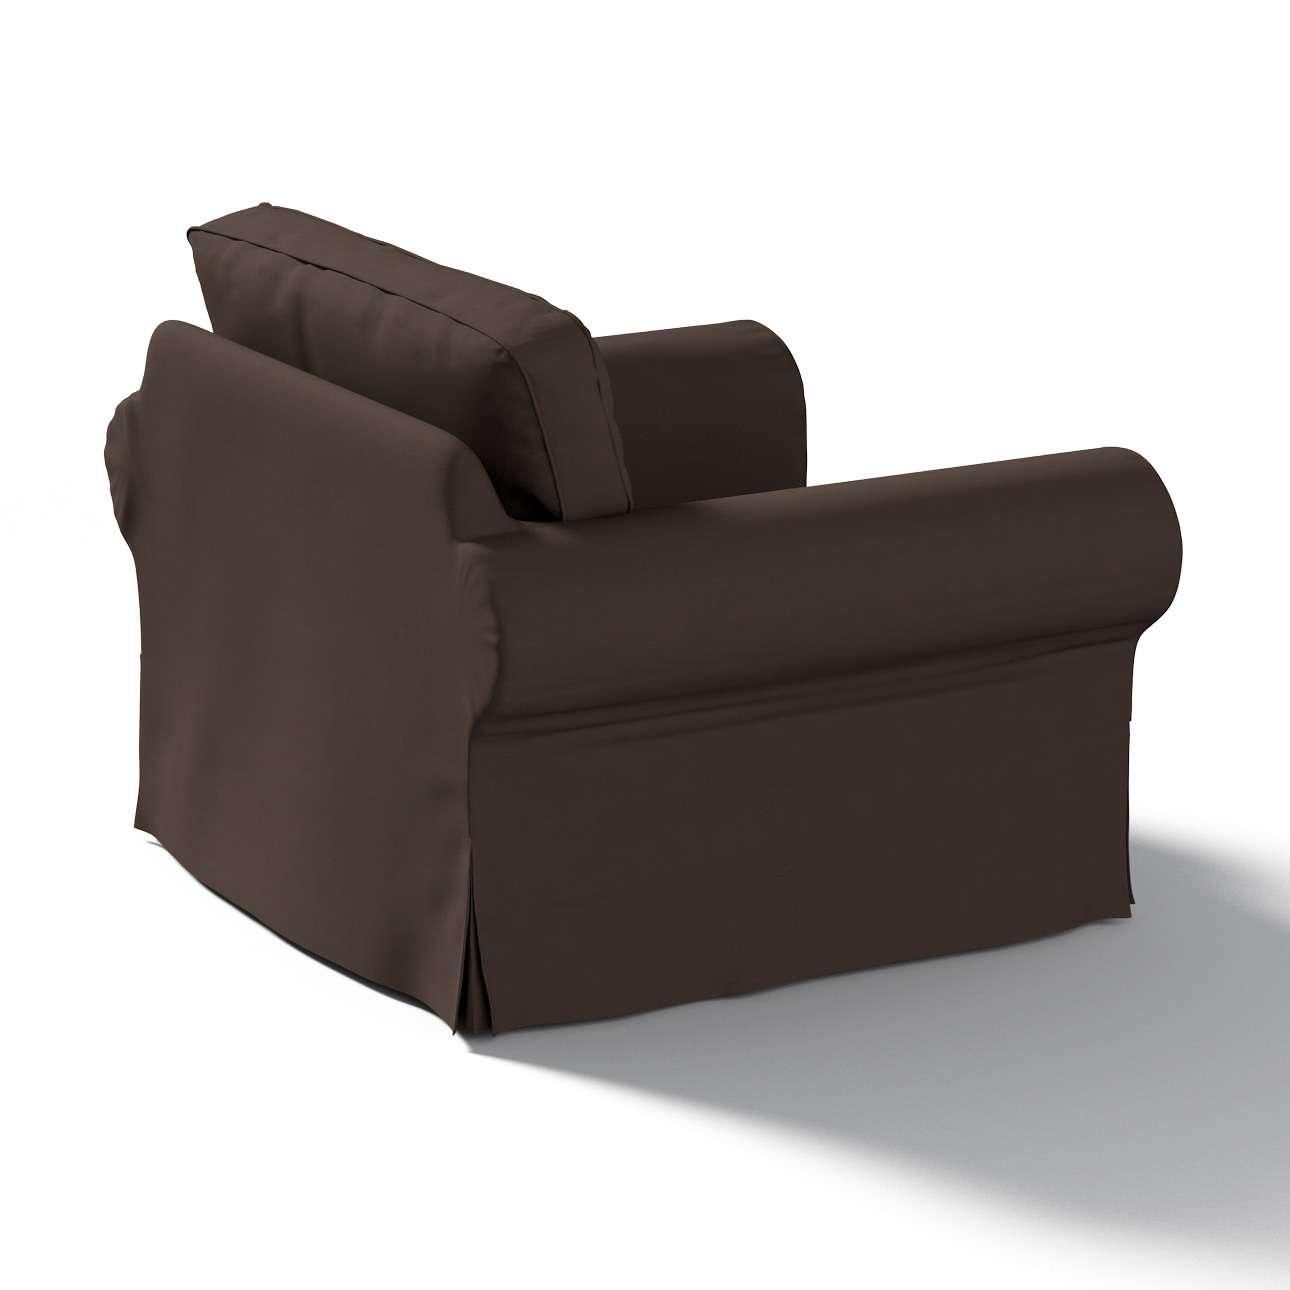 Ektorp Sesselbezug Sesselhusse, Ektorp Sessel von der Kollektion Cotton Panama, Stoff: 702-03